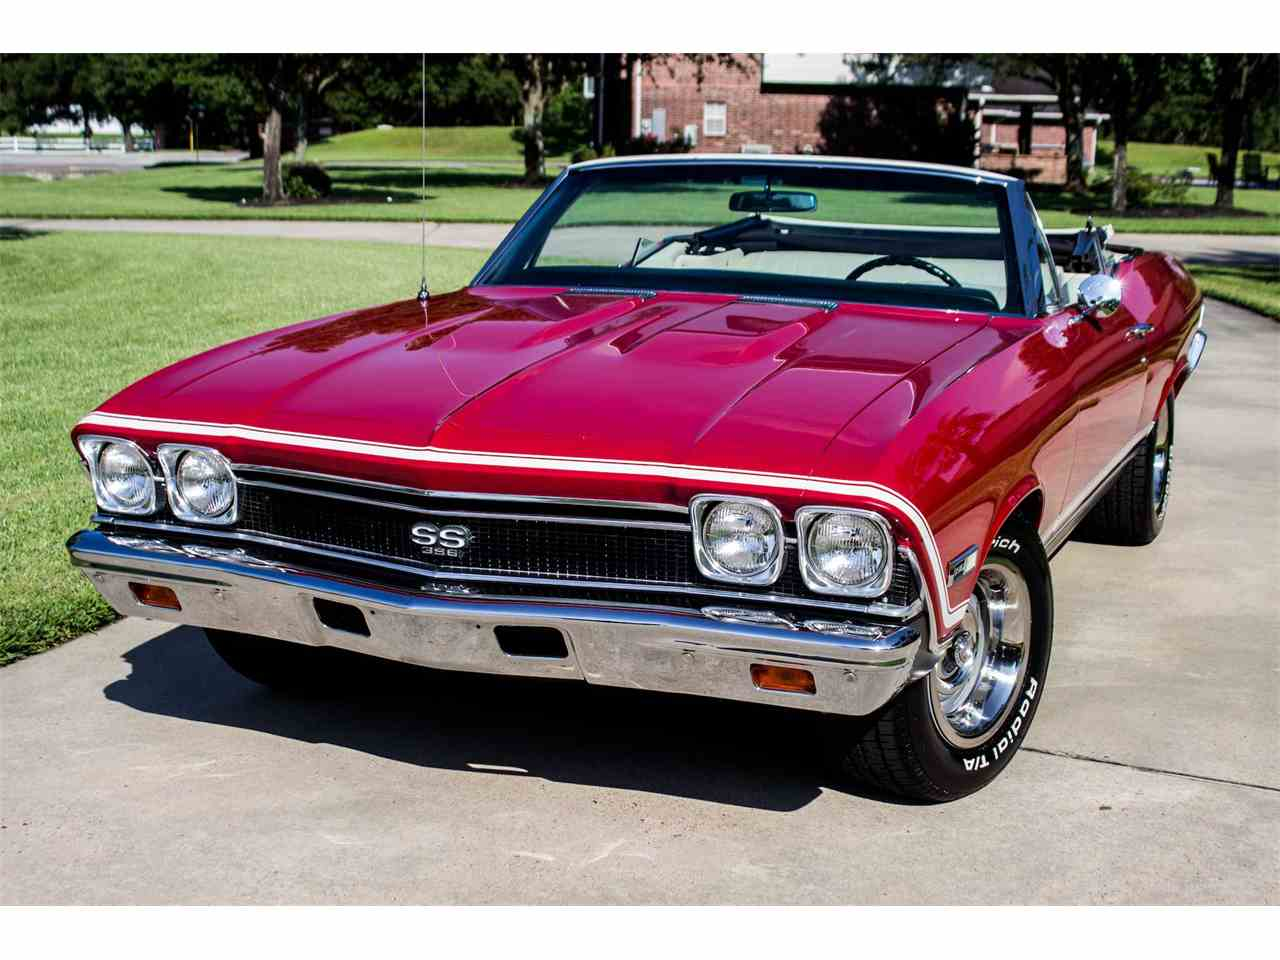 1968 Chevelle Ss Www Pixshark Com Images Galleries